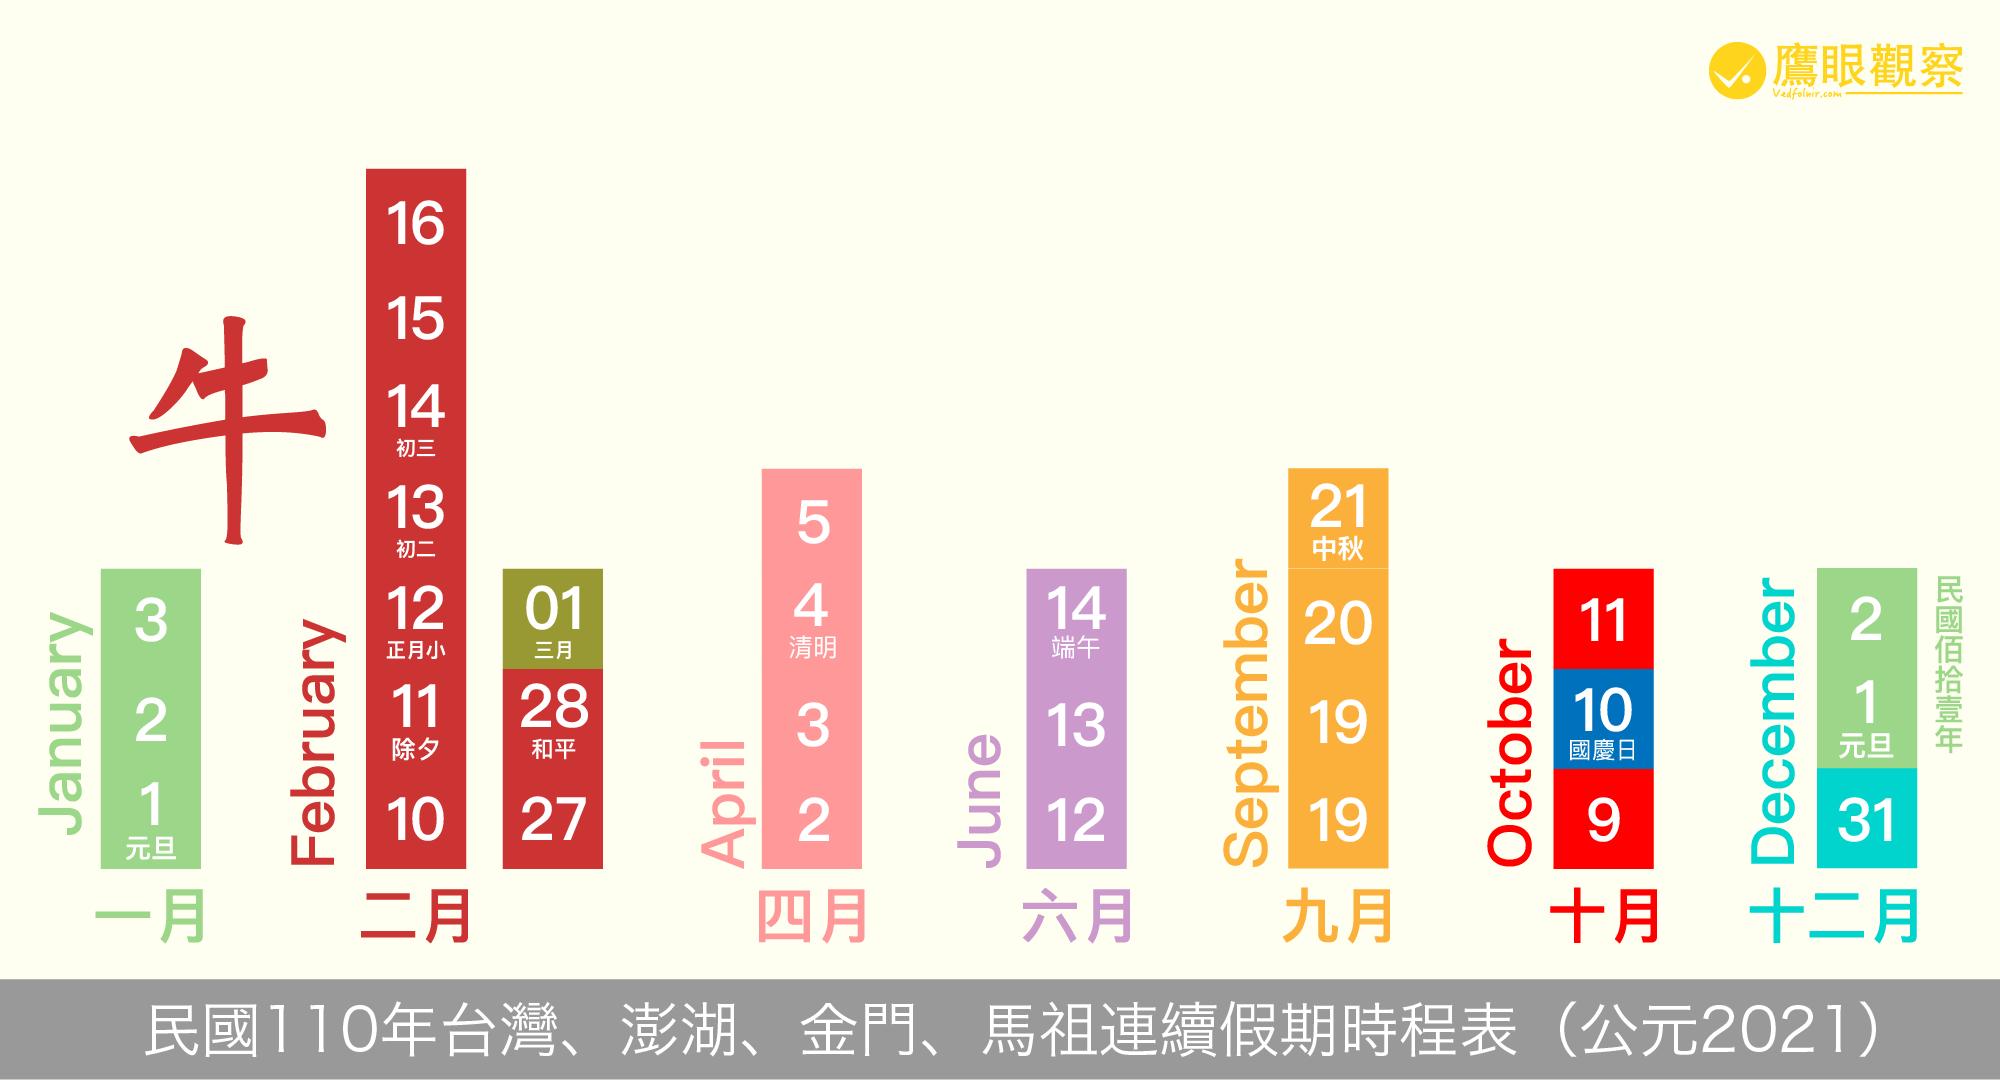 Timetable of consecutive holidays in the Republic of China 110 years old 民國110年放假行事曆:連續假期(國定假日、春節年假)臺澎金馬2021連假日程表(補假、上班日)